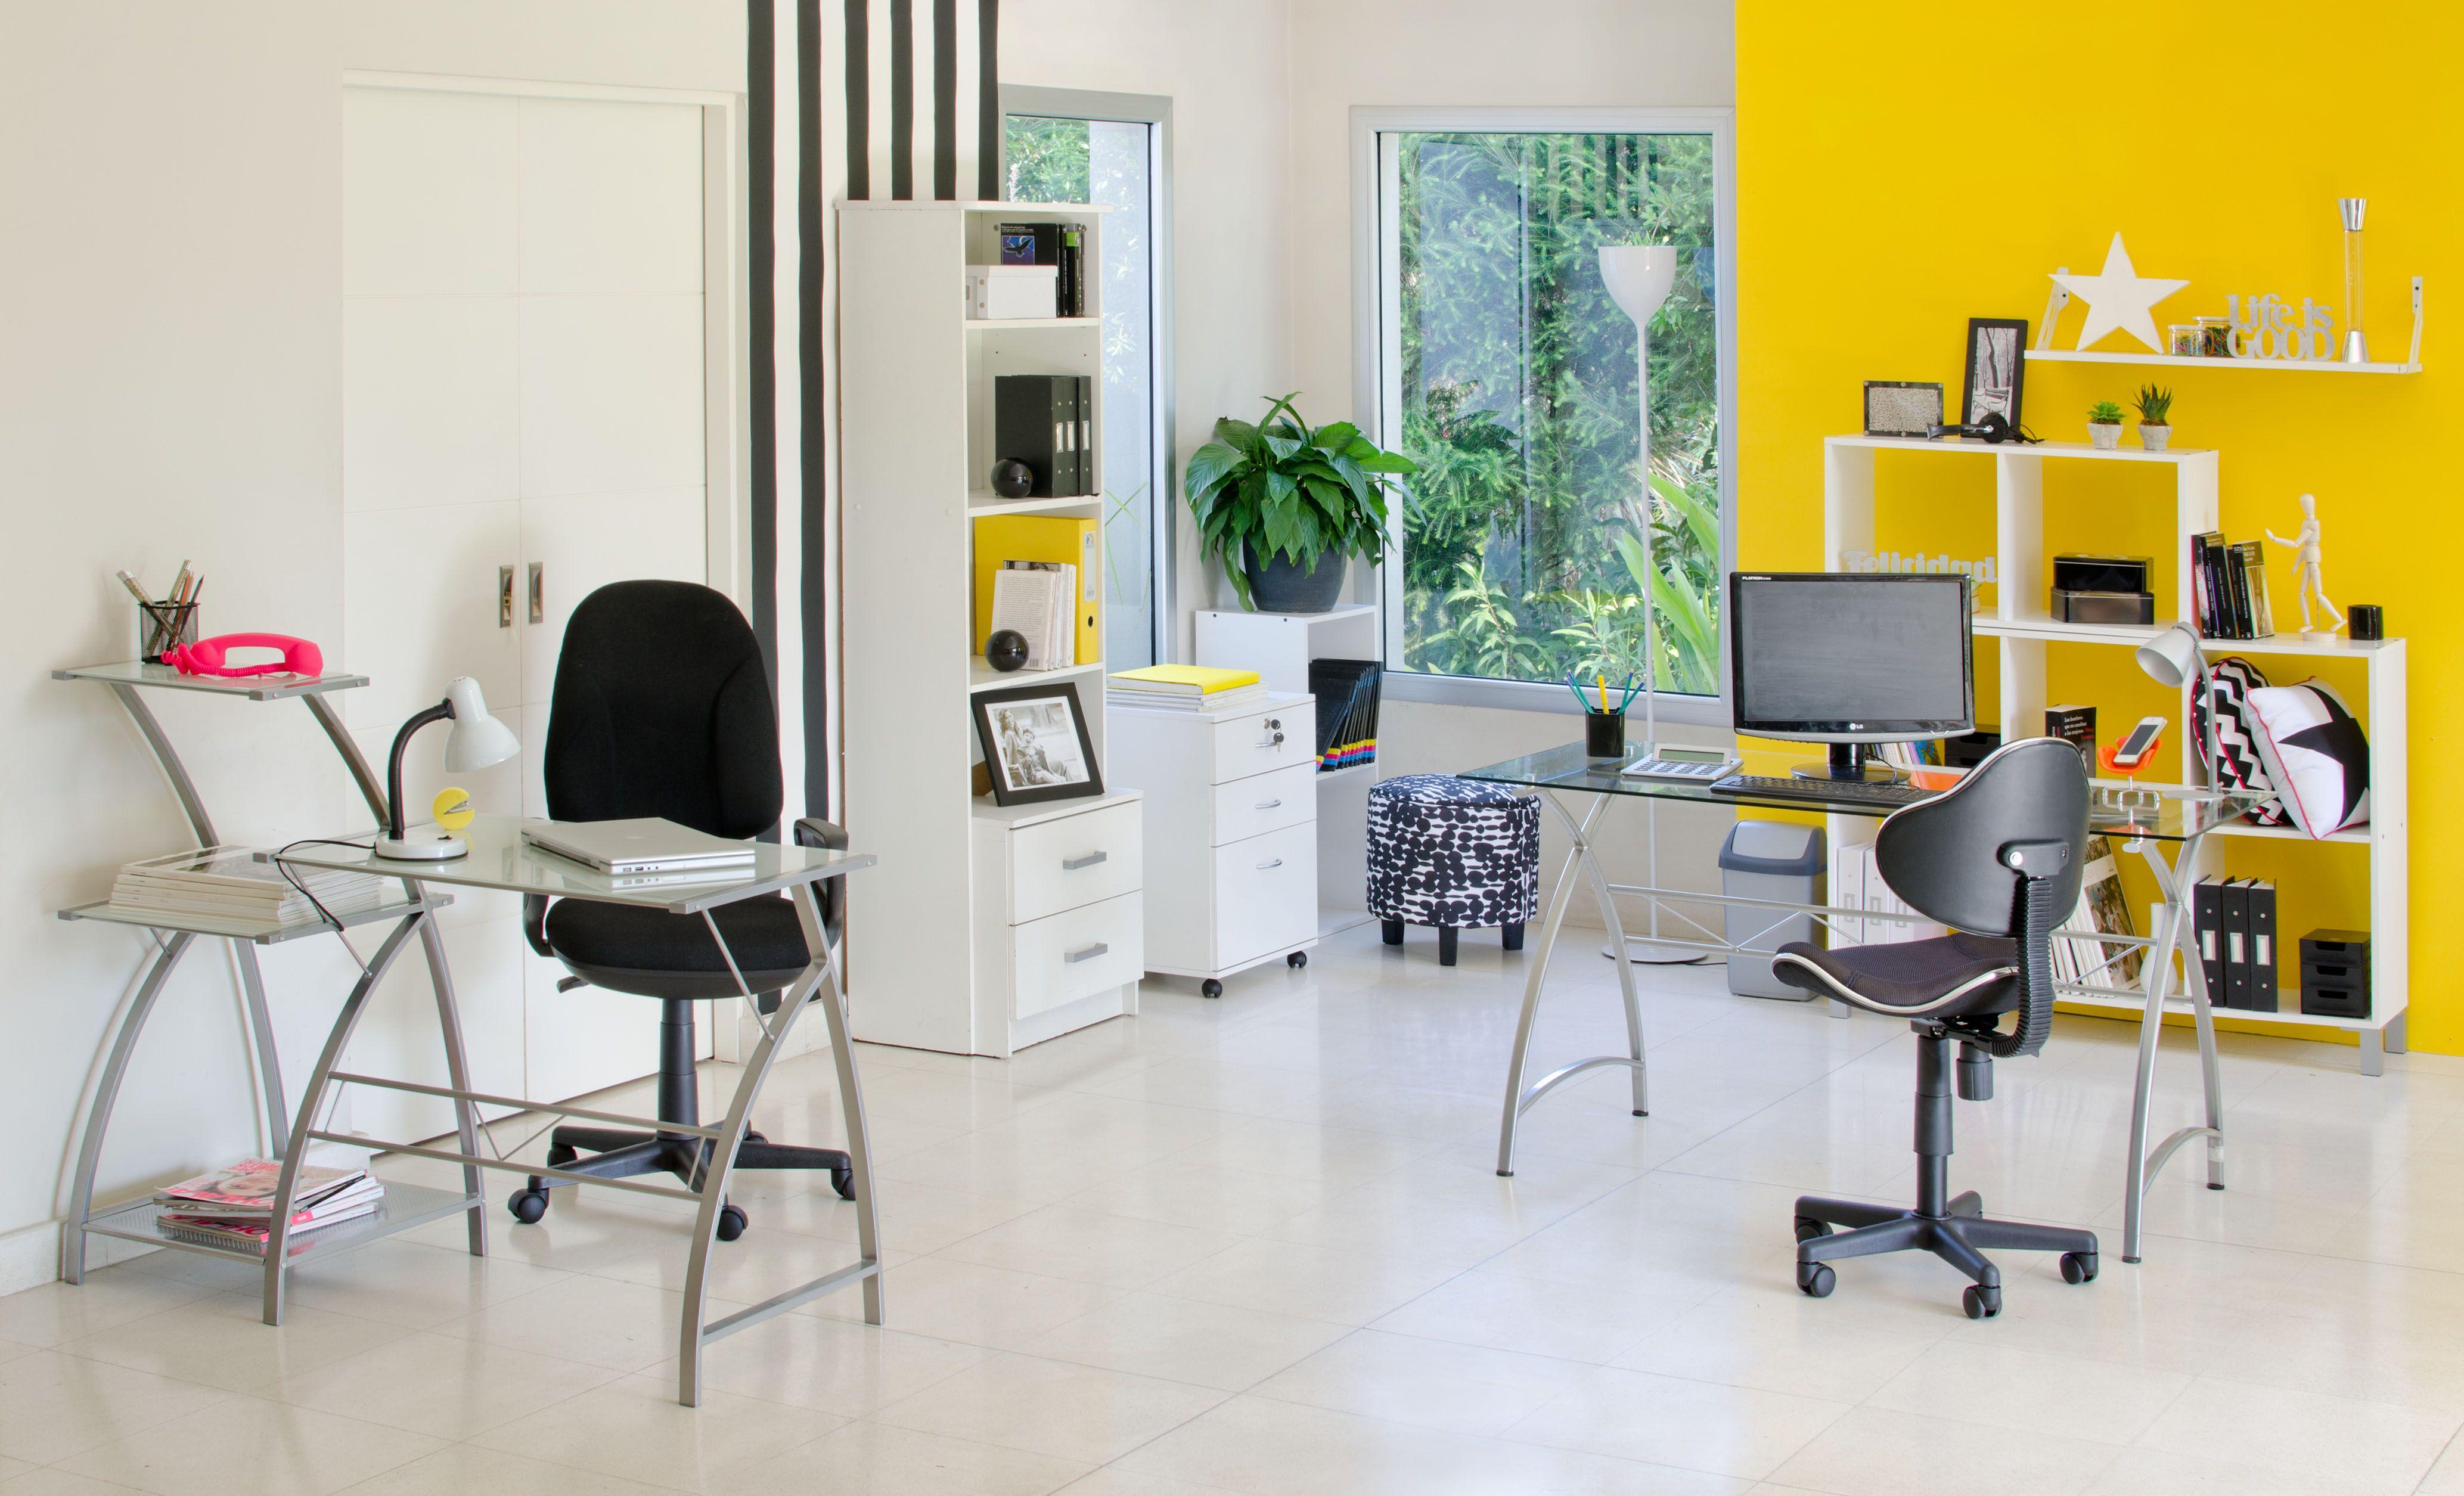 #Oficina #HomeOficce #Espacios #Hogar